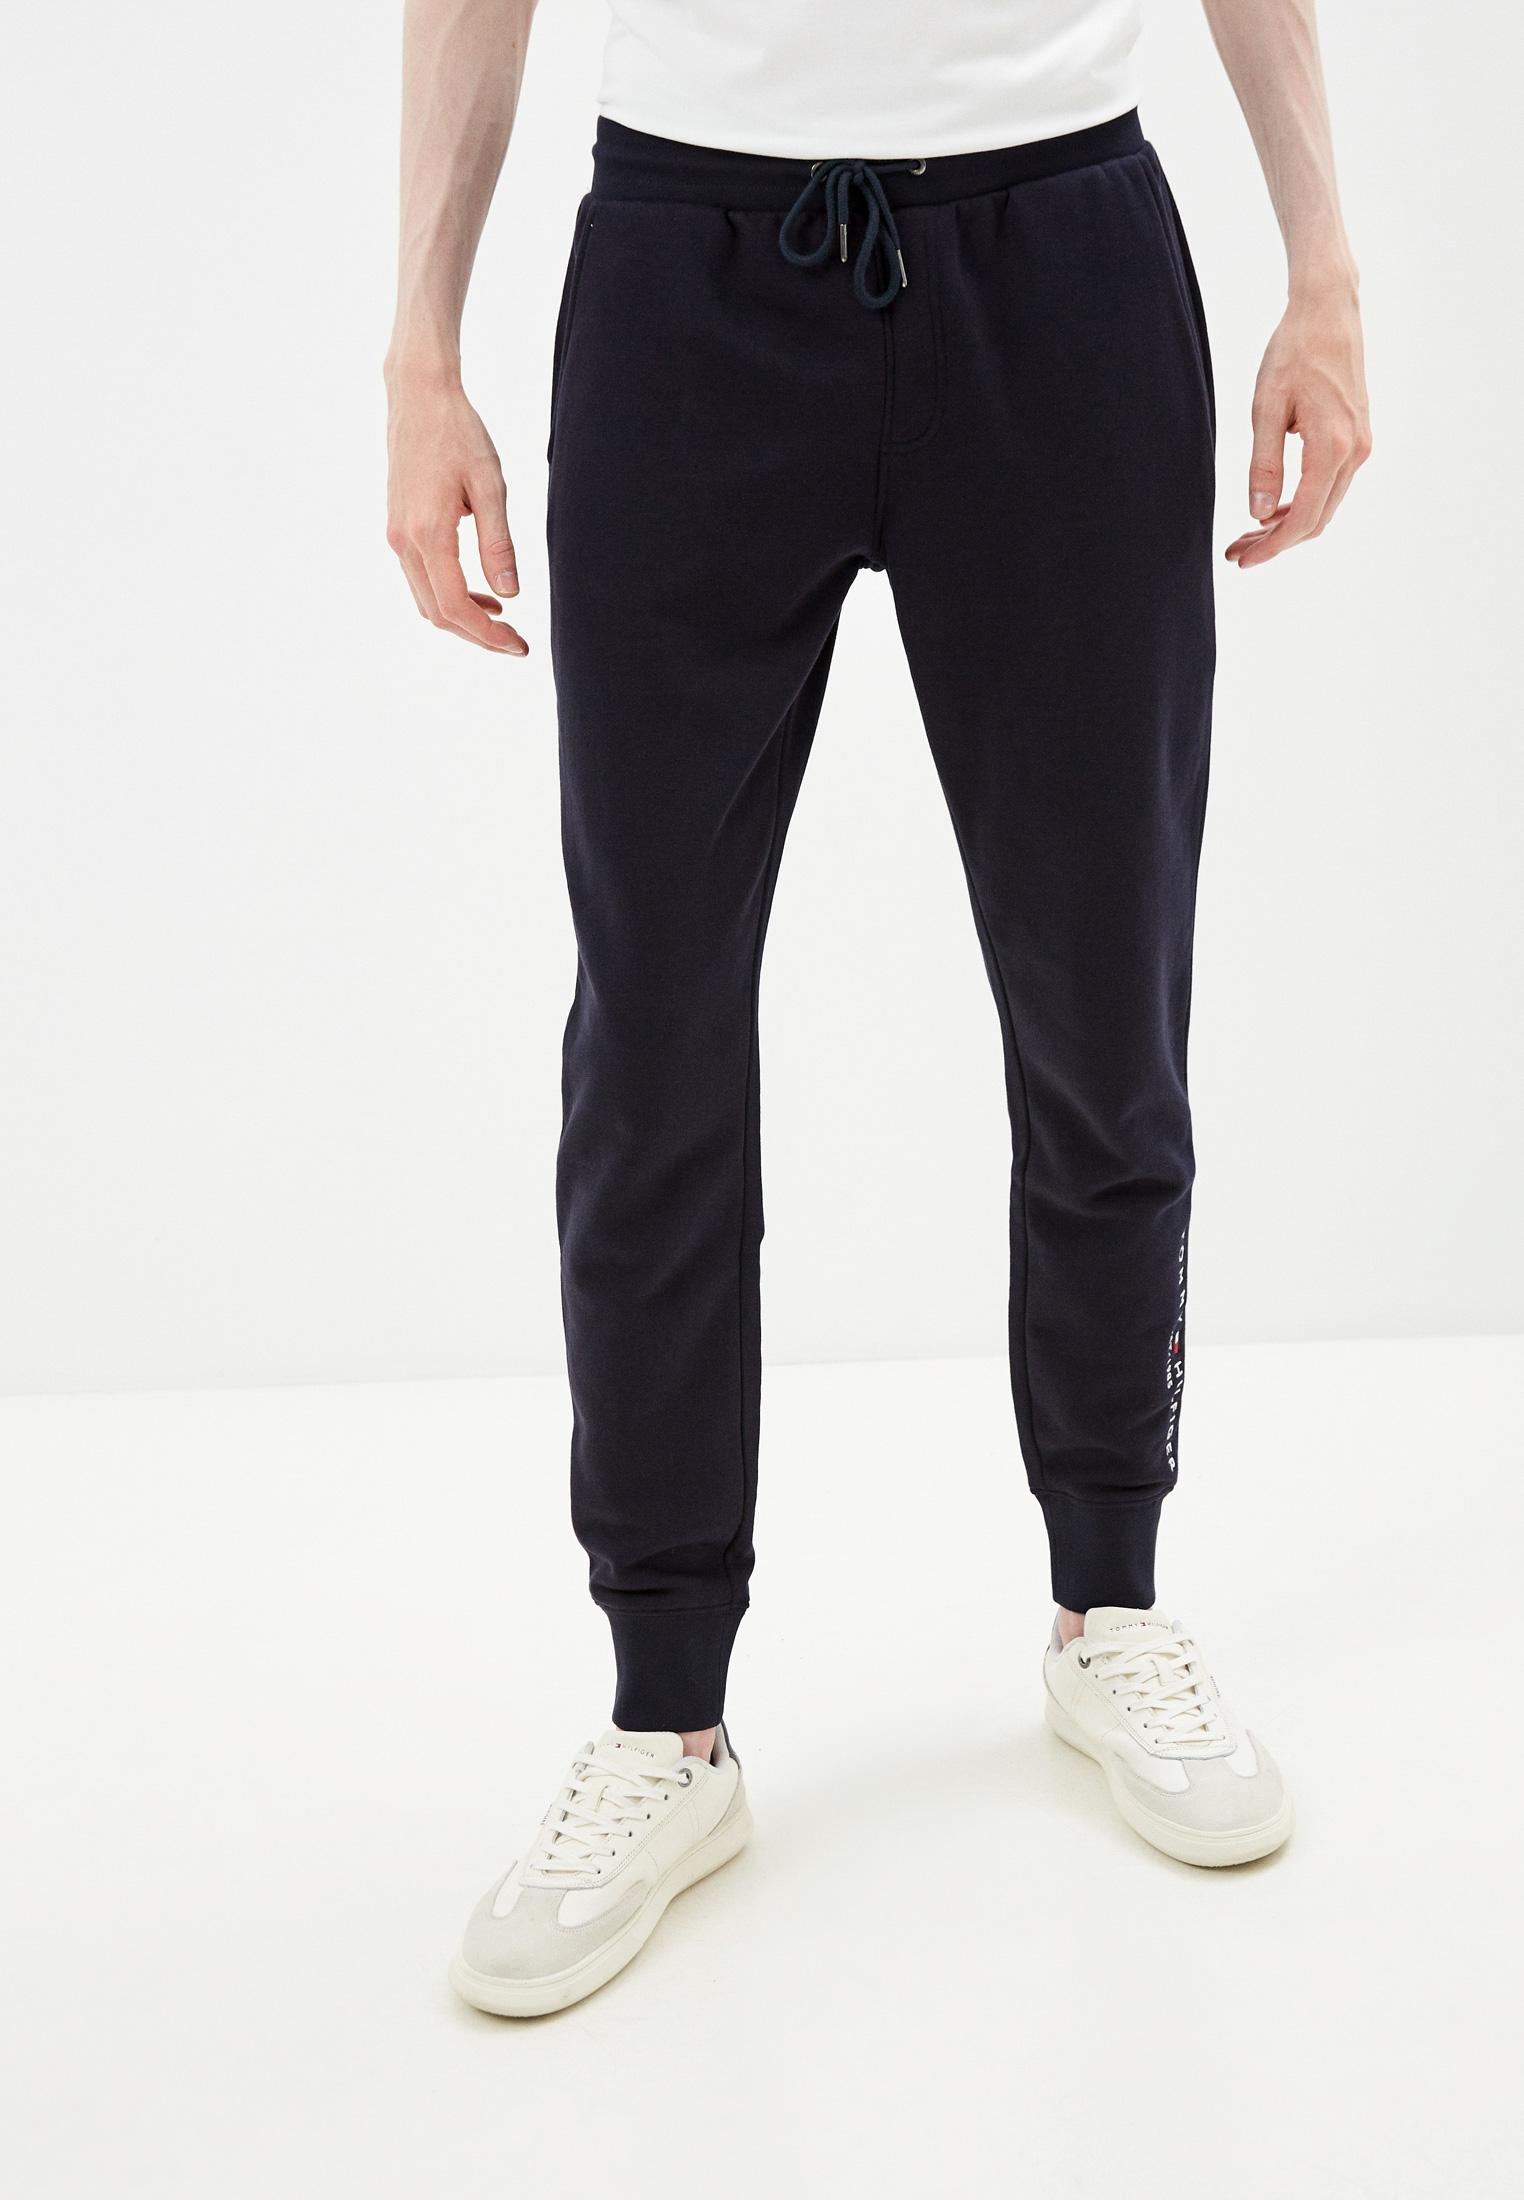 Мужские спортивные брюки Tommy Hilfiger (Томми Хилфигер) MW0MW18715